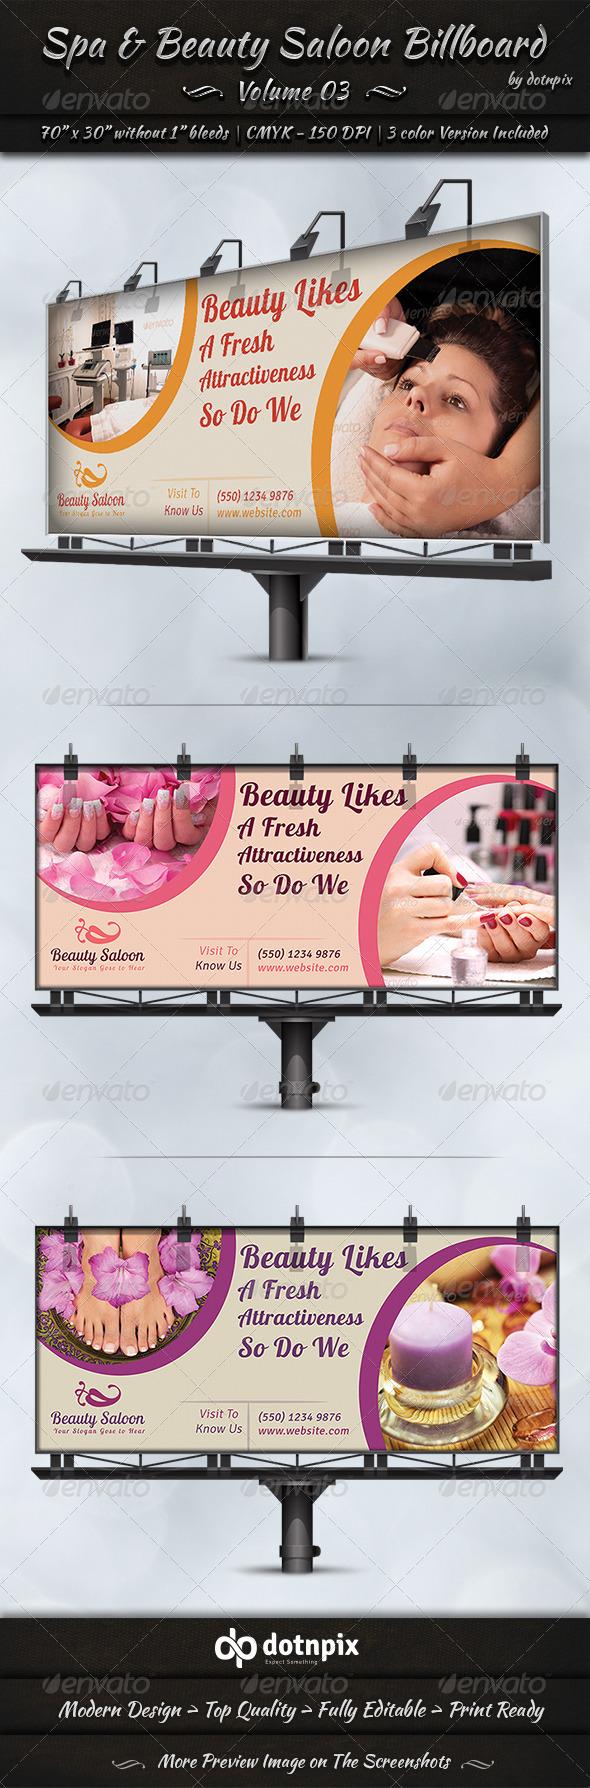 GraphicRiver Spa & Beauty Saloon Billboard Volume 3 7837453